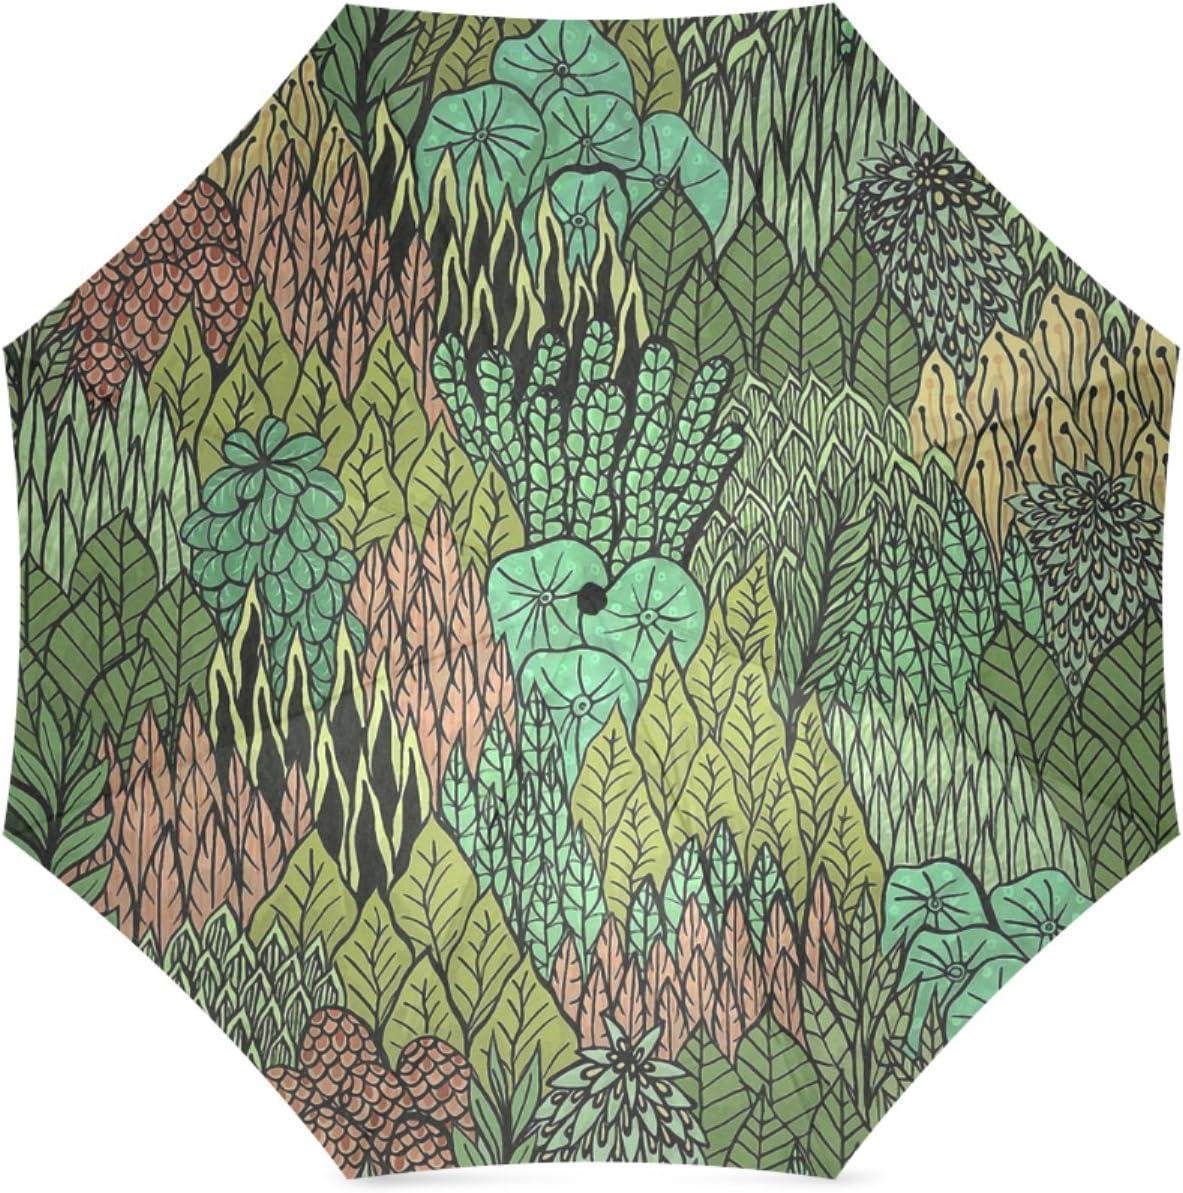 Beautytool Personalized April Leaves Foldable Sun Rain Anti-Uv Umbrella